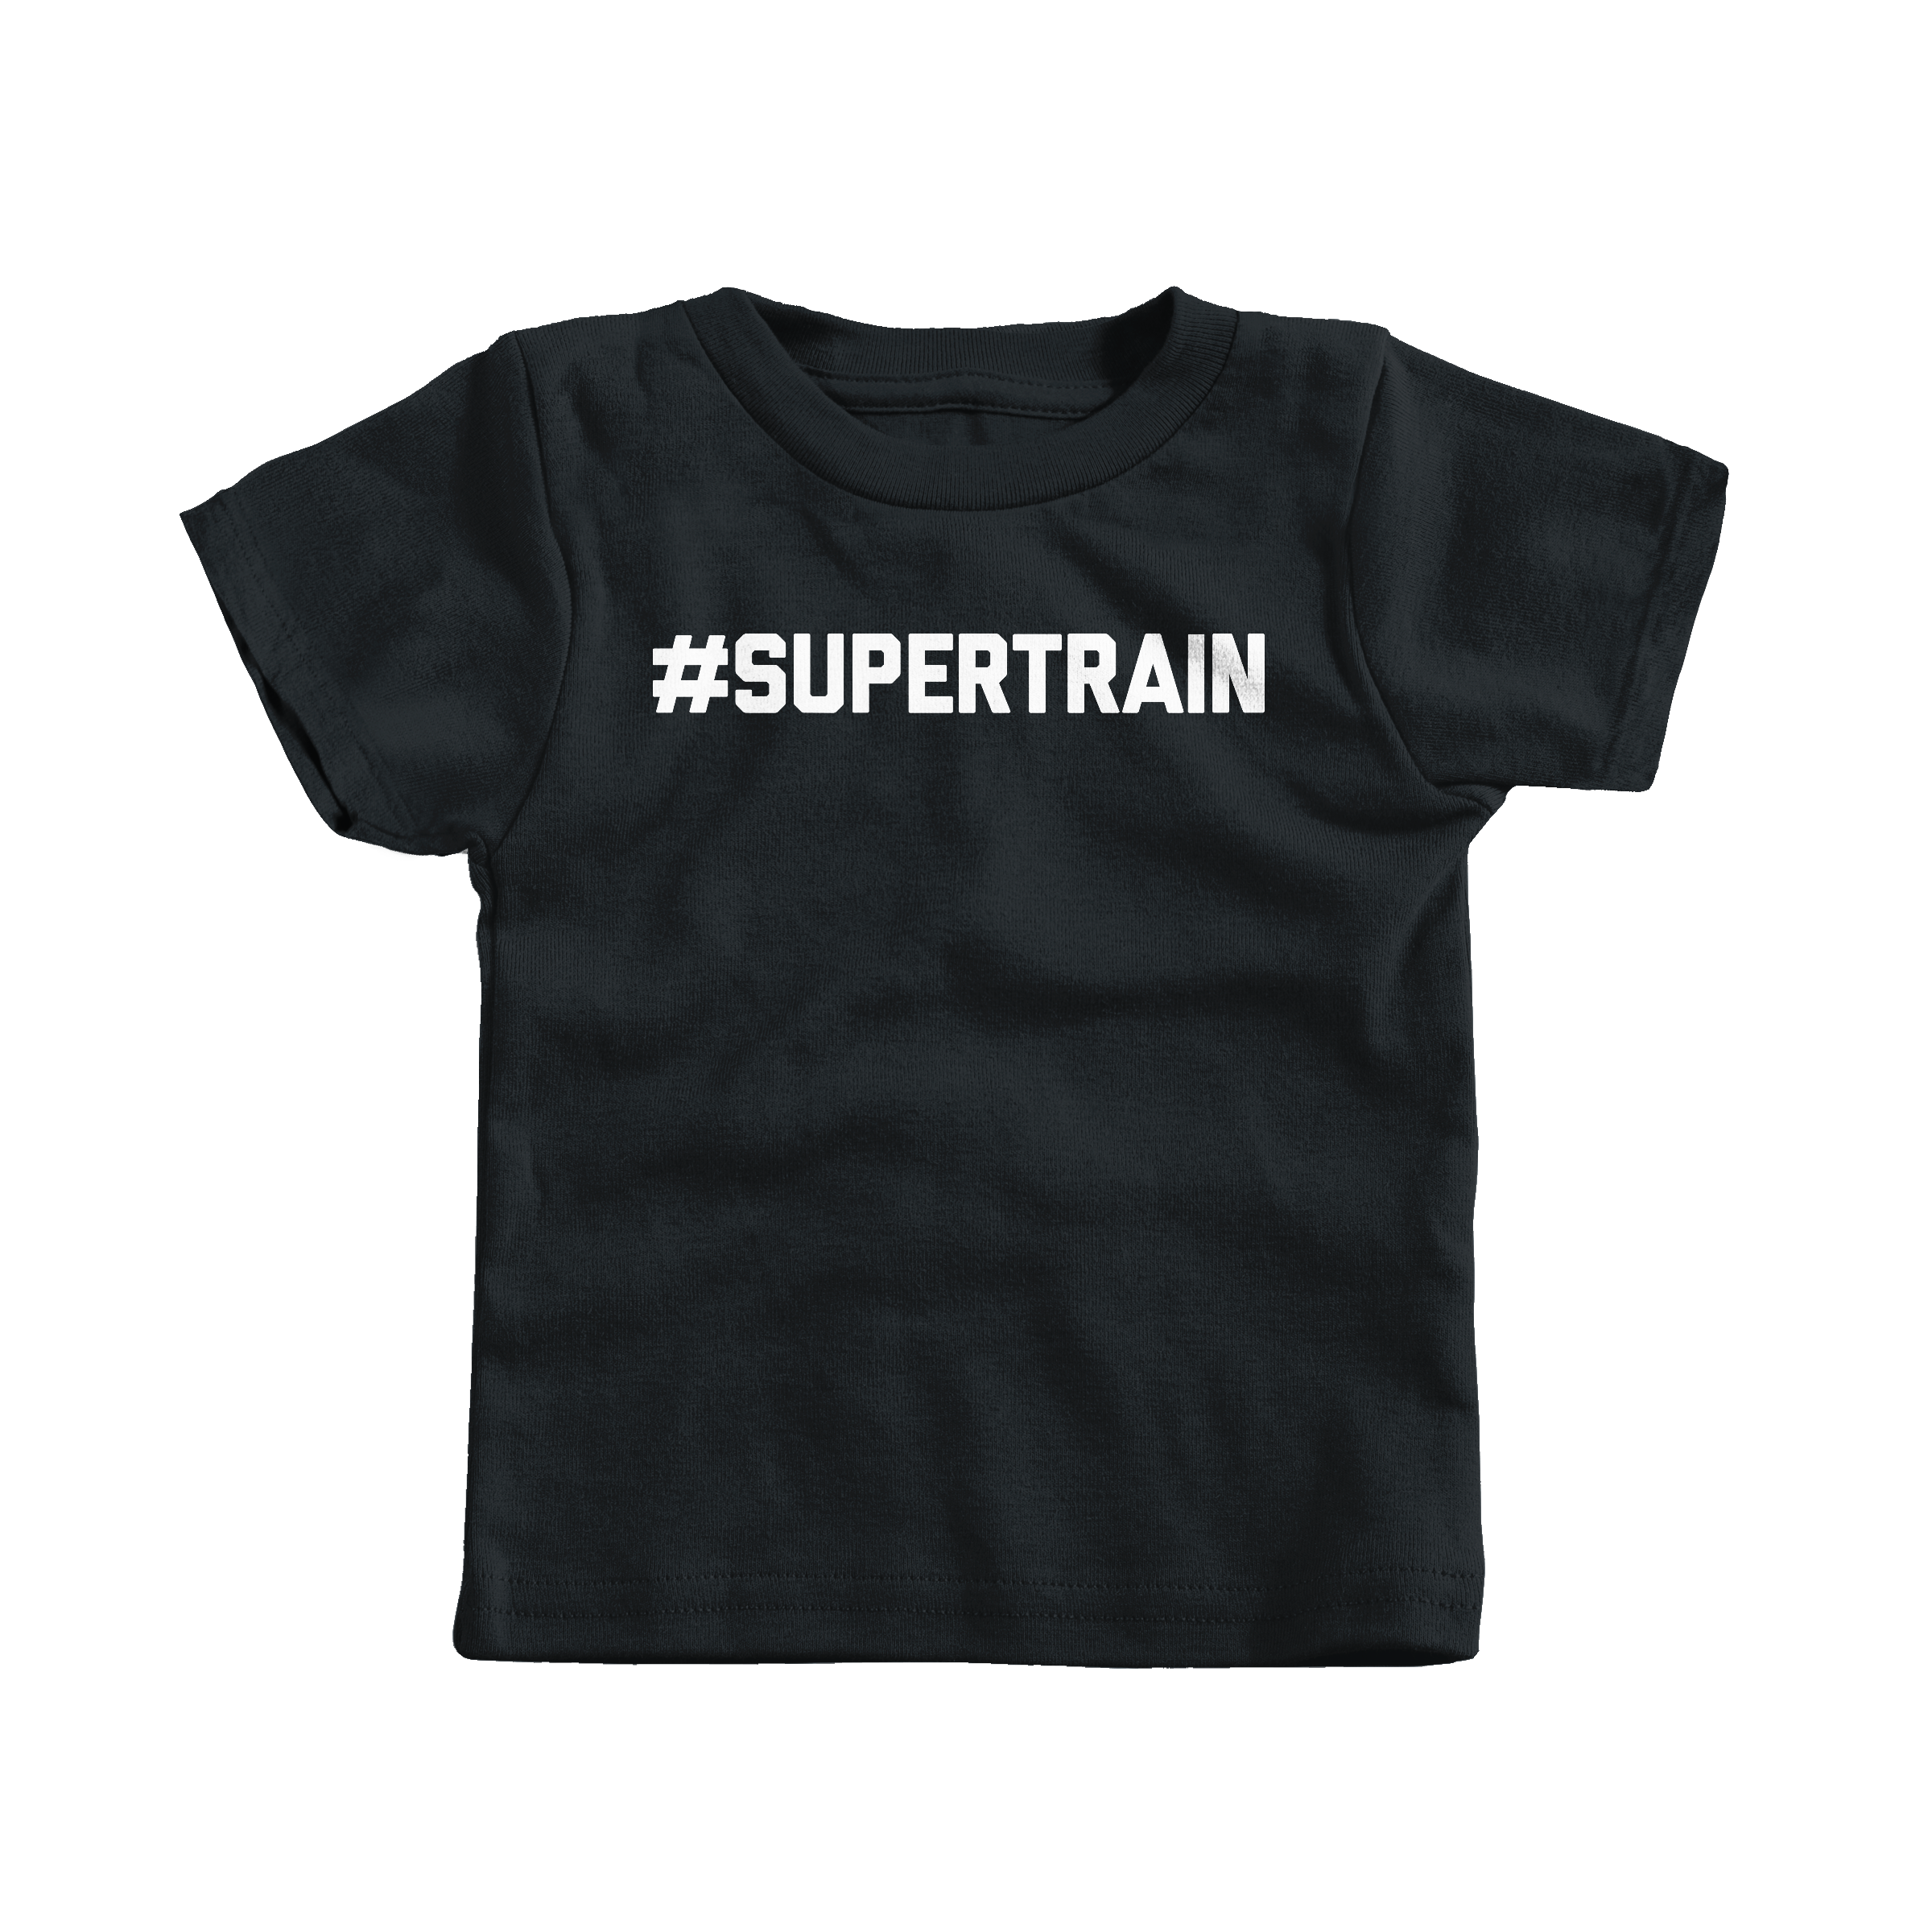 #SUPERTRAIN